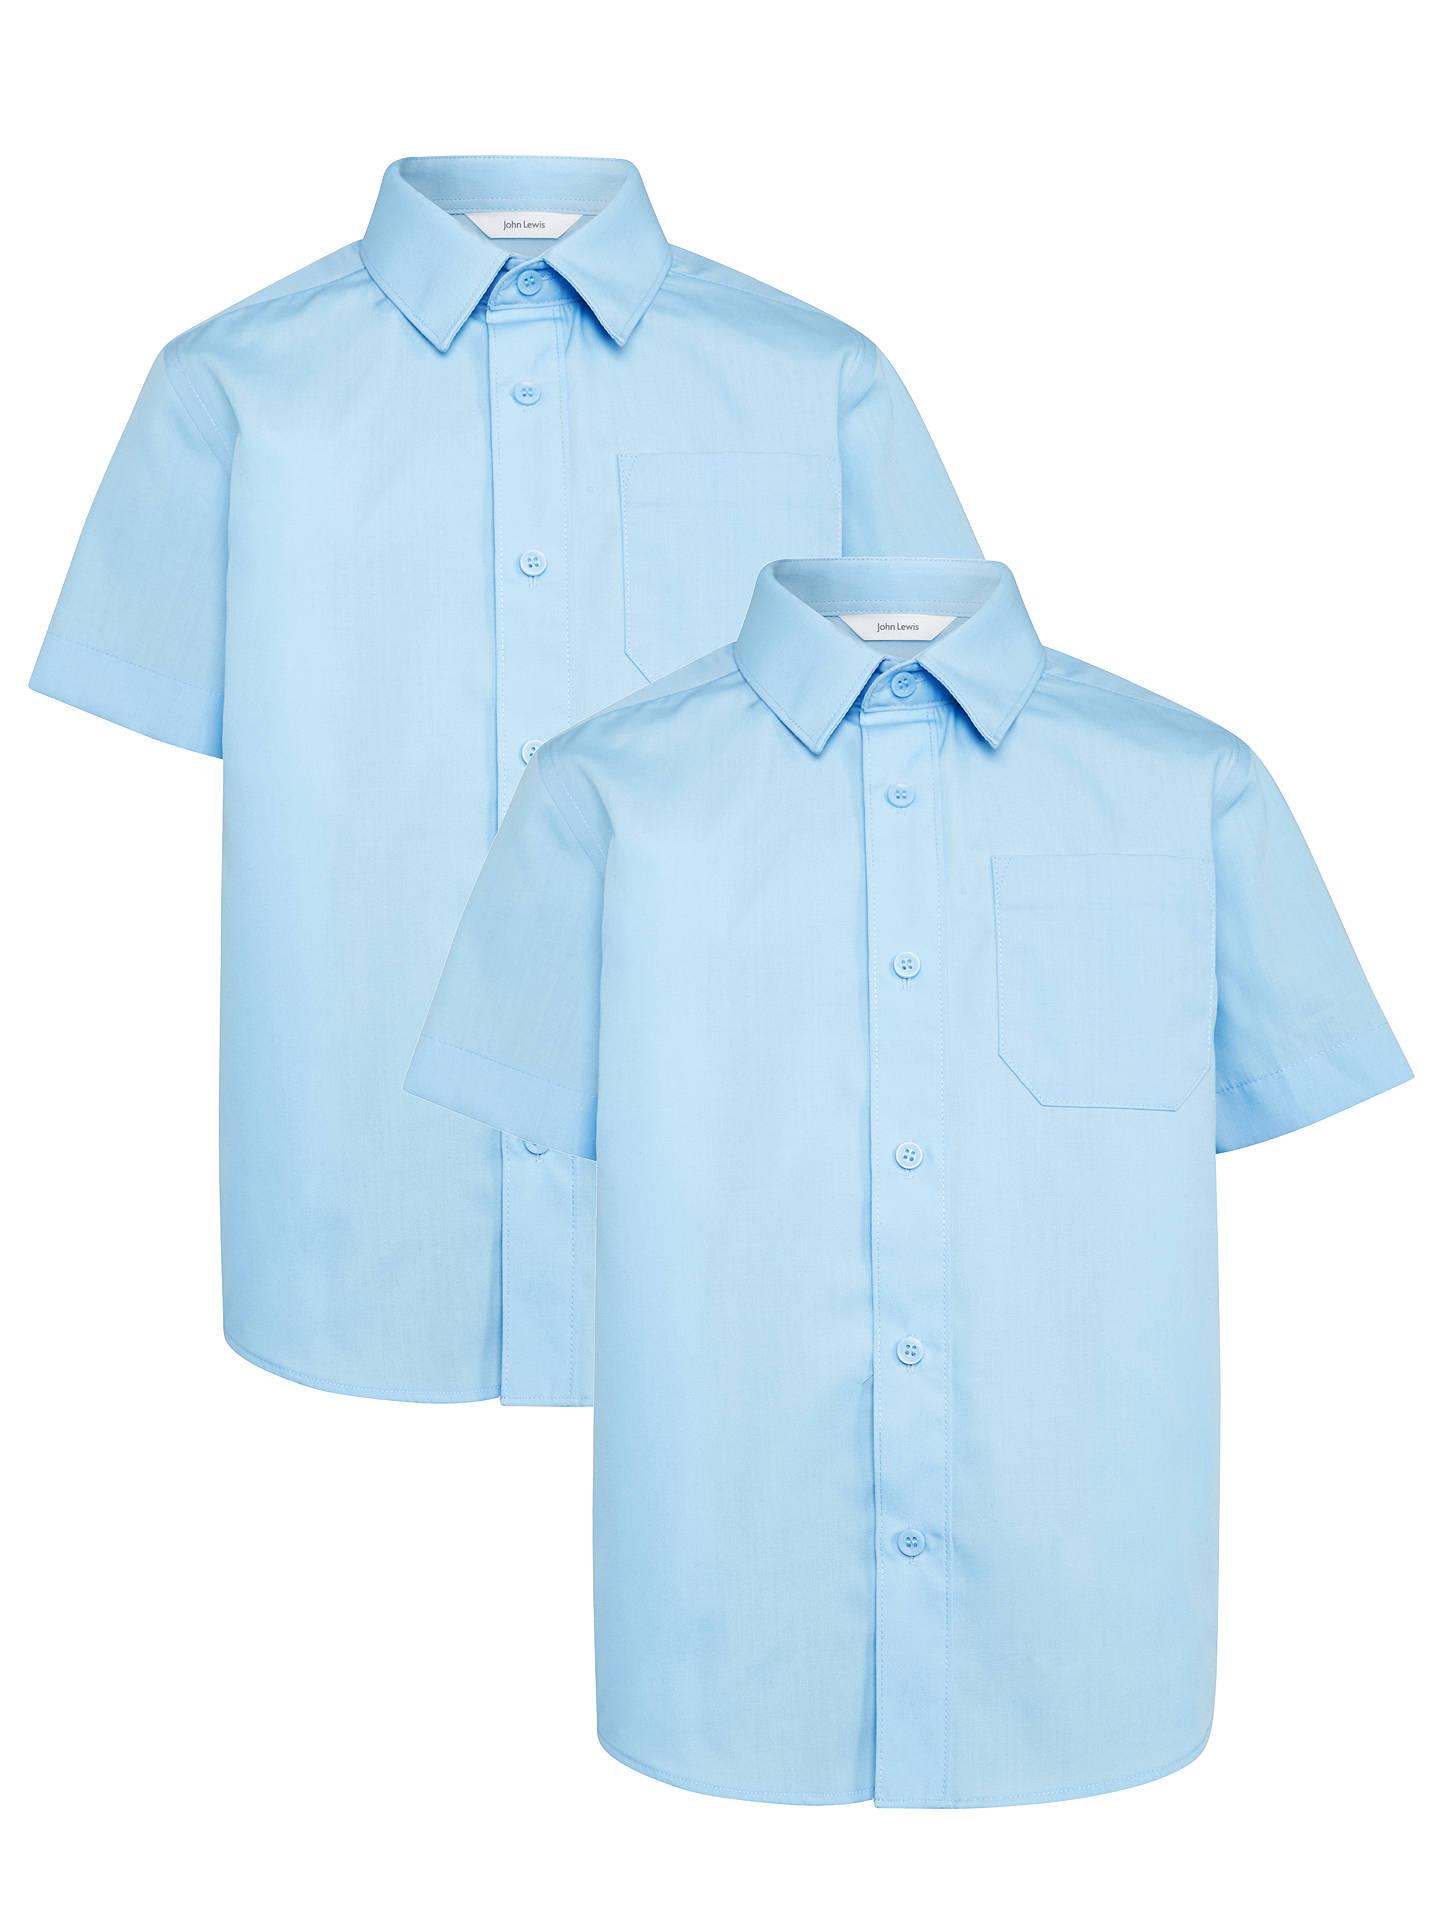 6ede76442 ... Buy John Lewis & Partners Boys' Easy Care Short Sleeve School Shirt,  Pack of ...